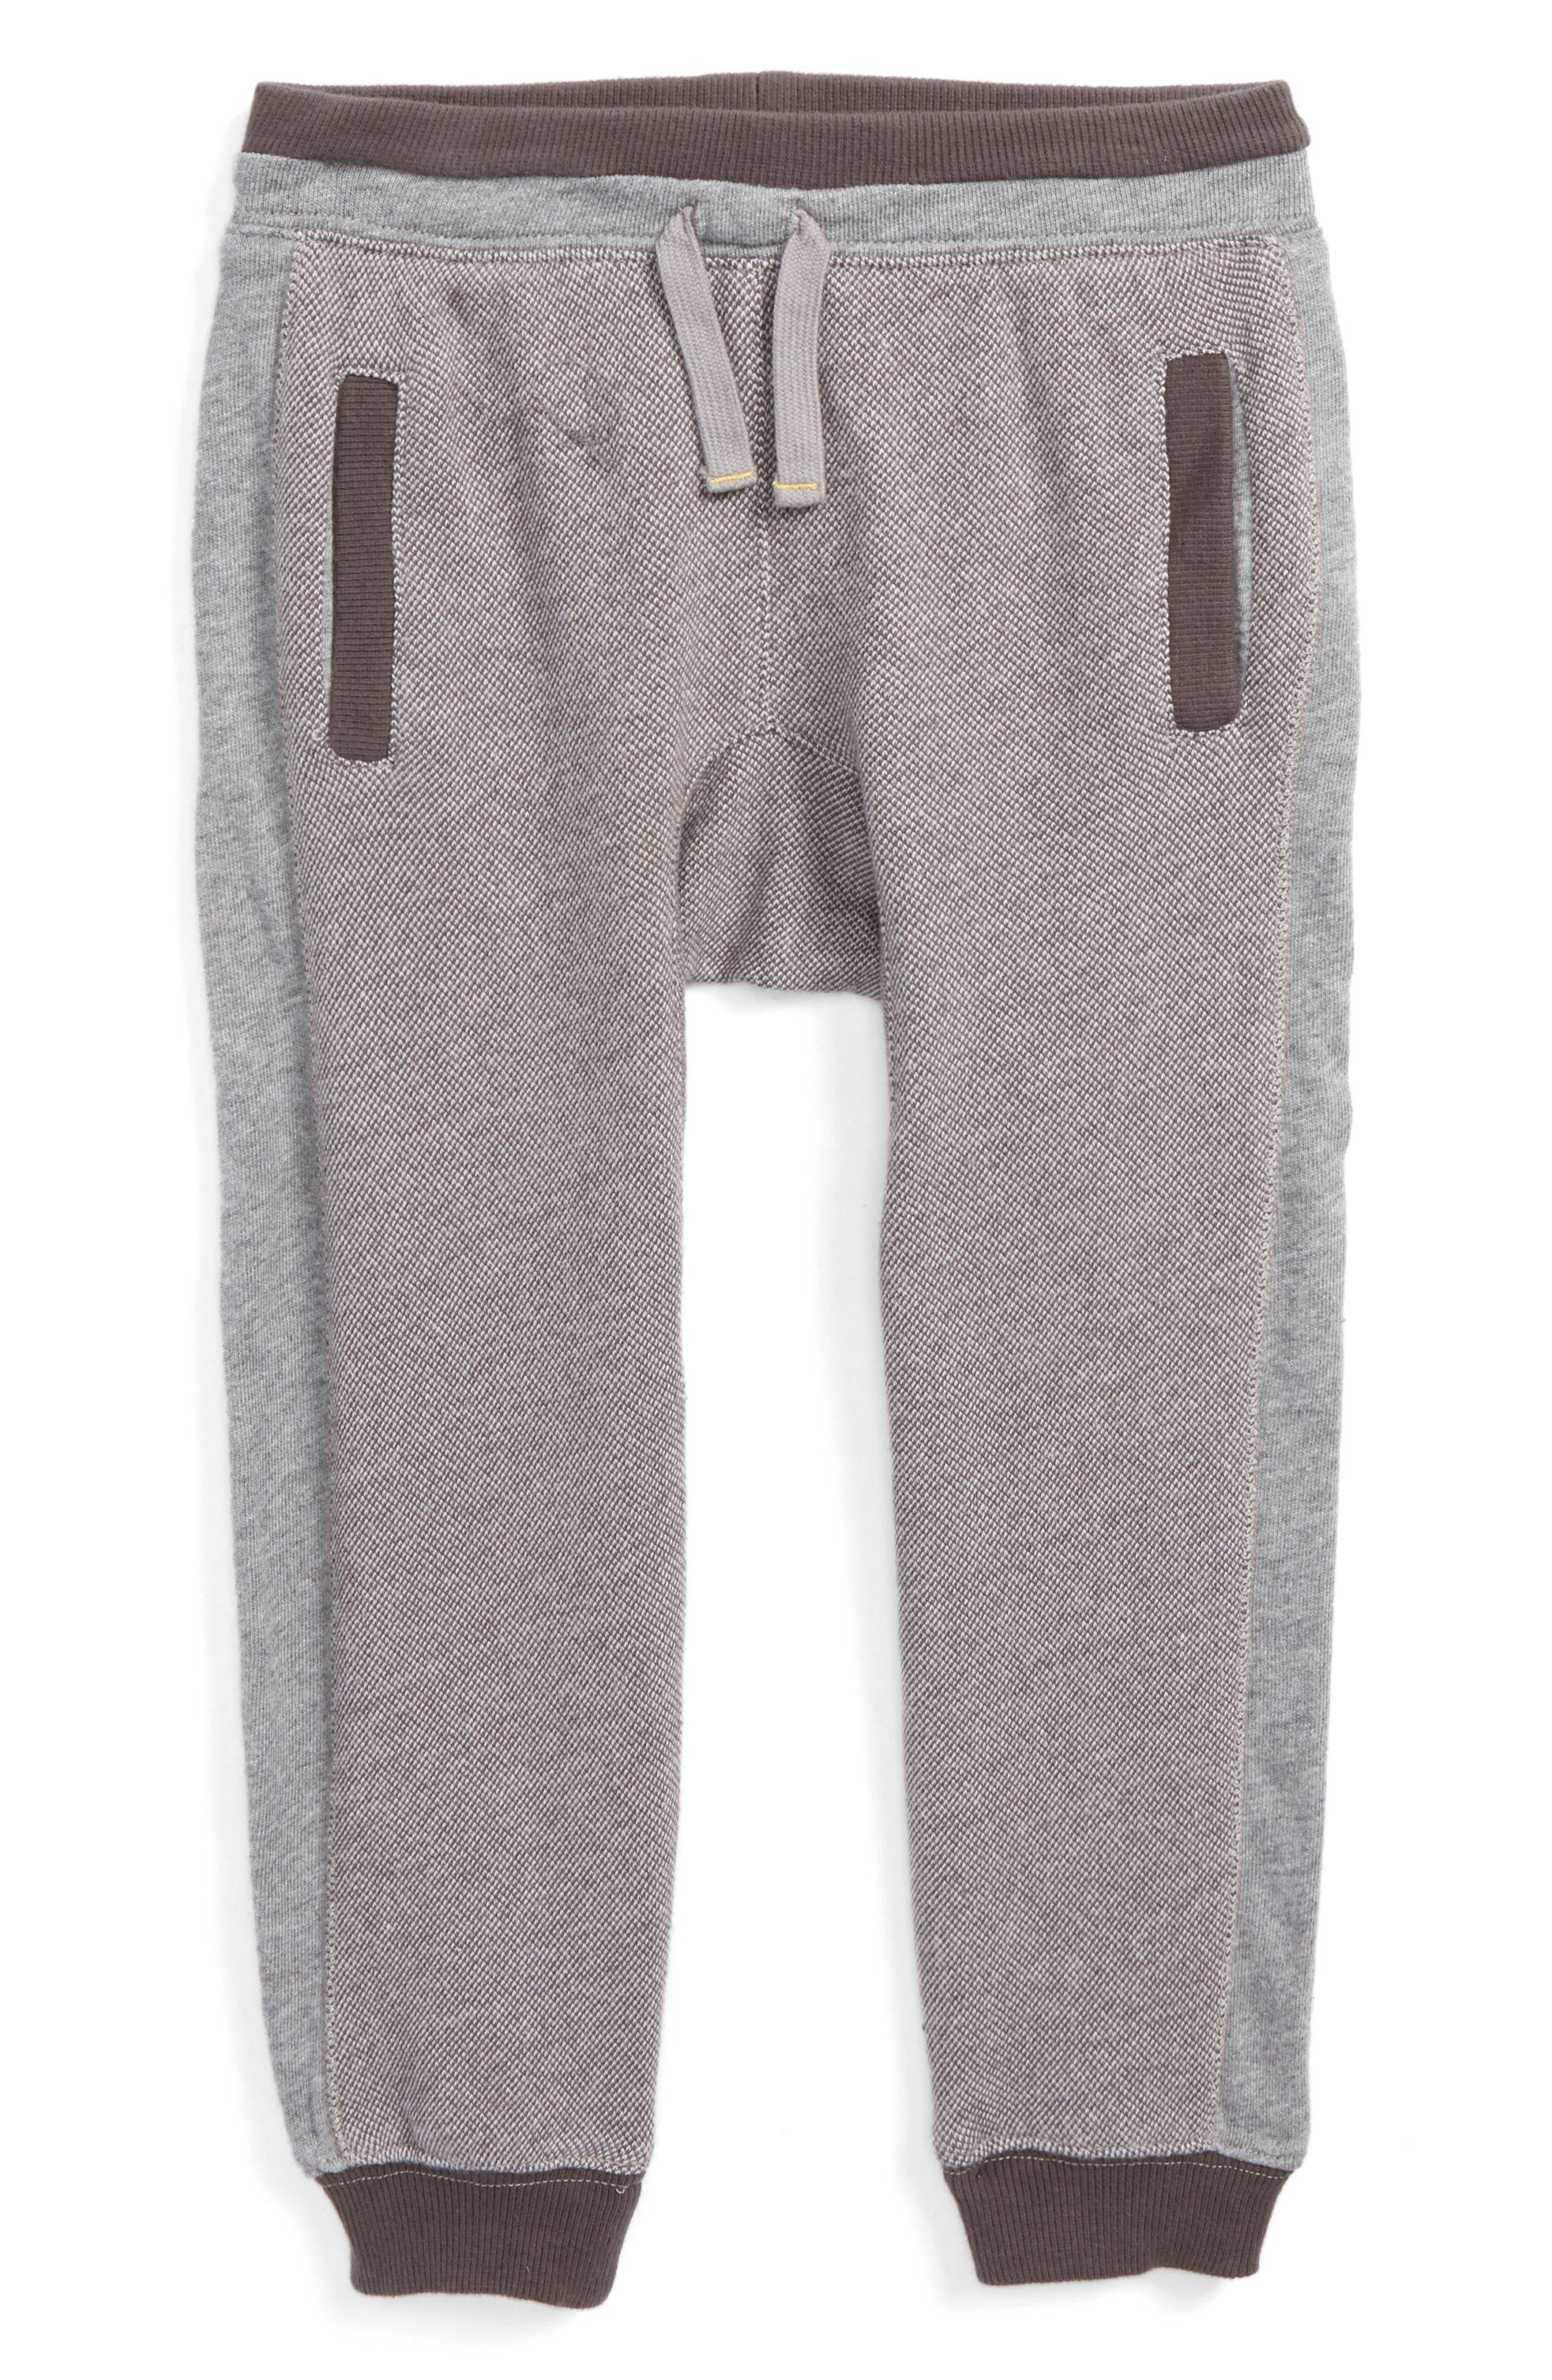 Birdseye Knit Jogger Pants,                         Main,                         color, Grey